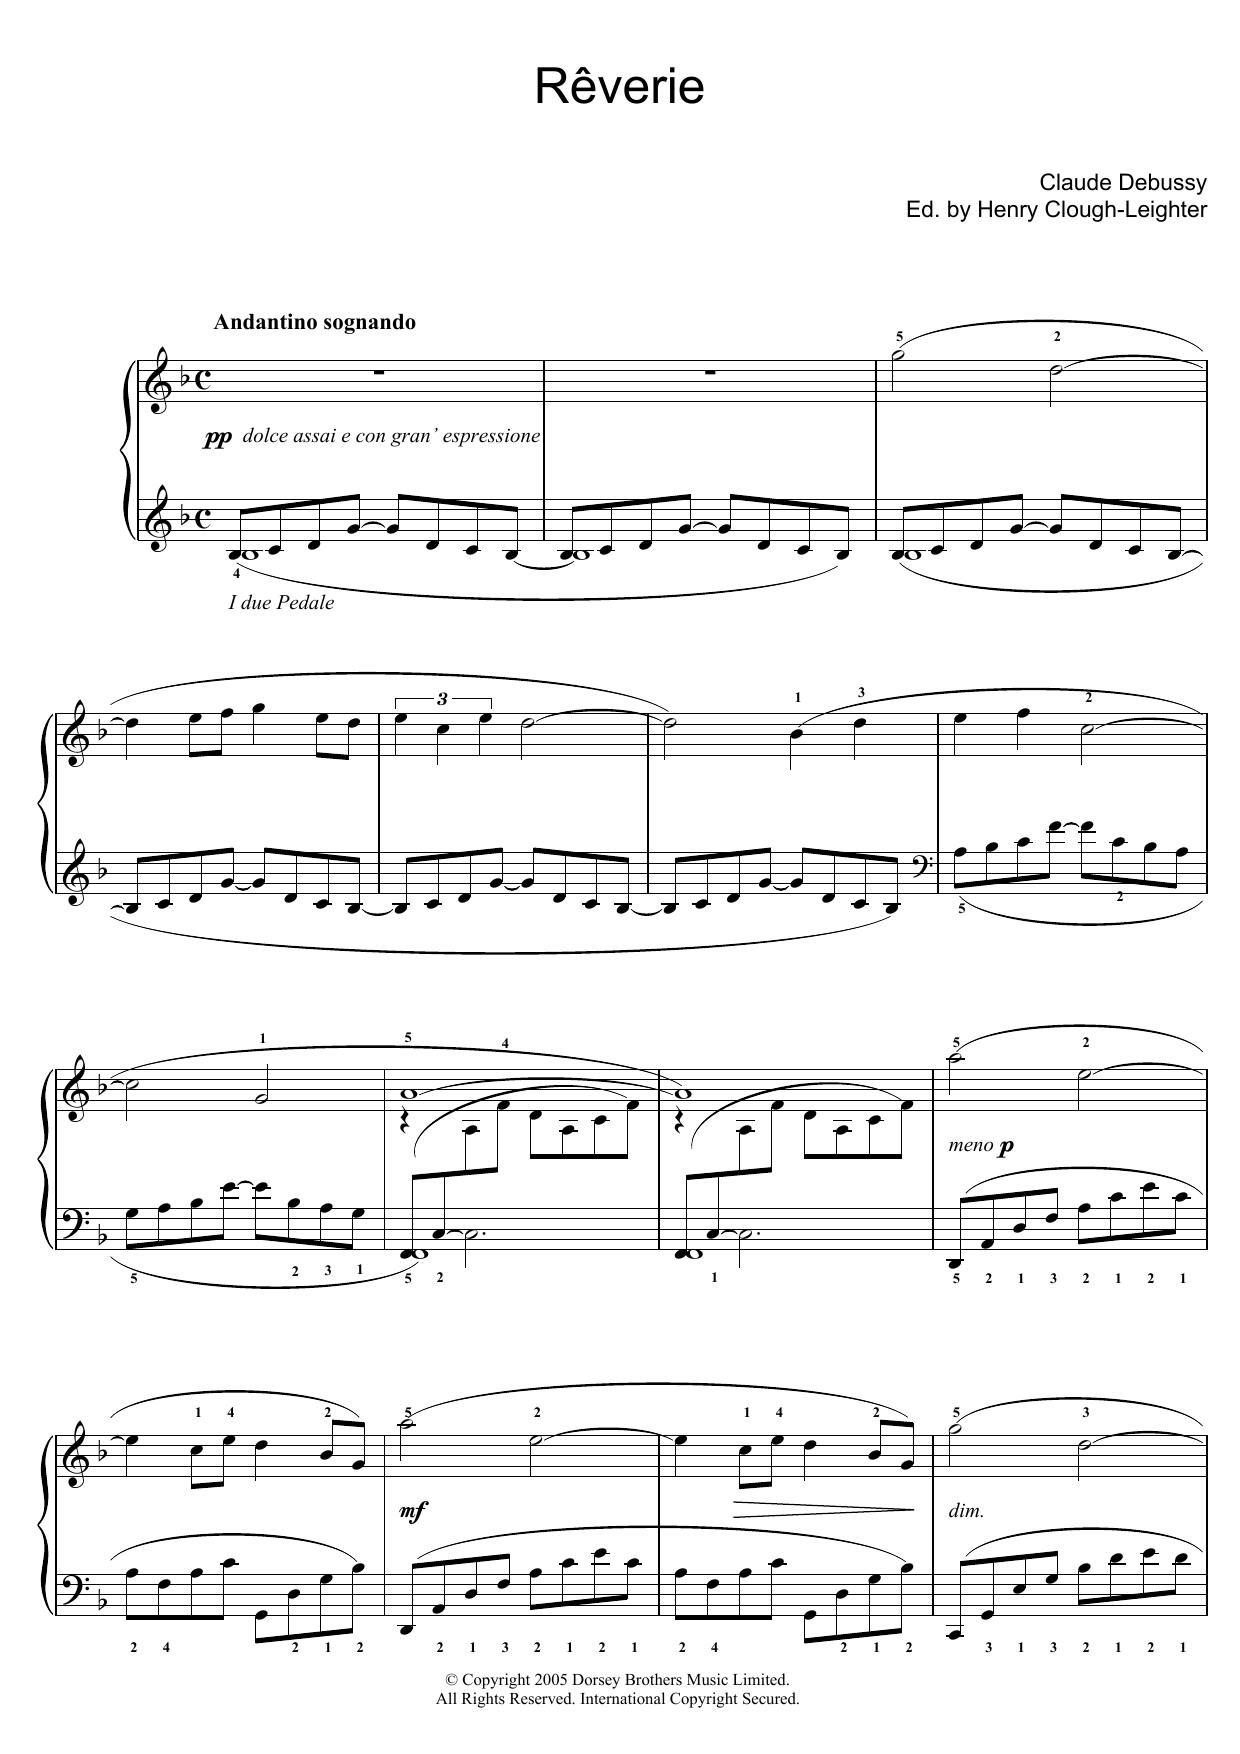 Claude Debussy - Reverie